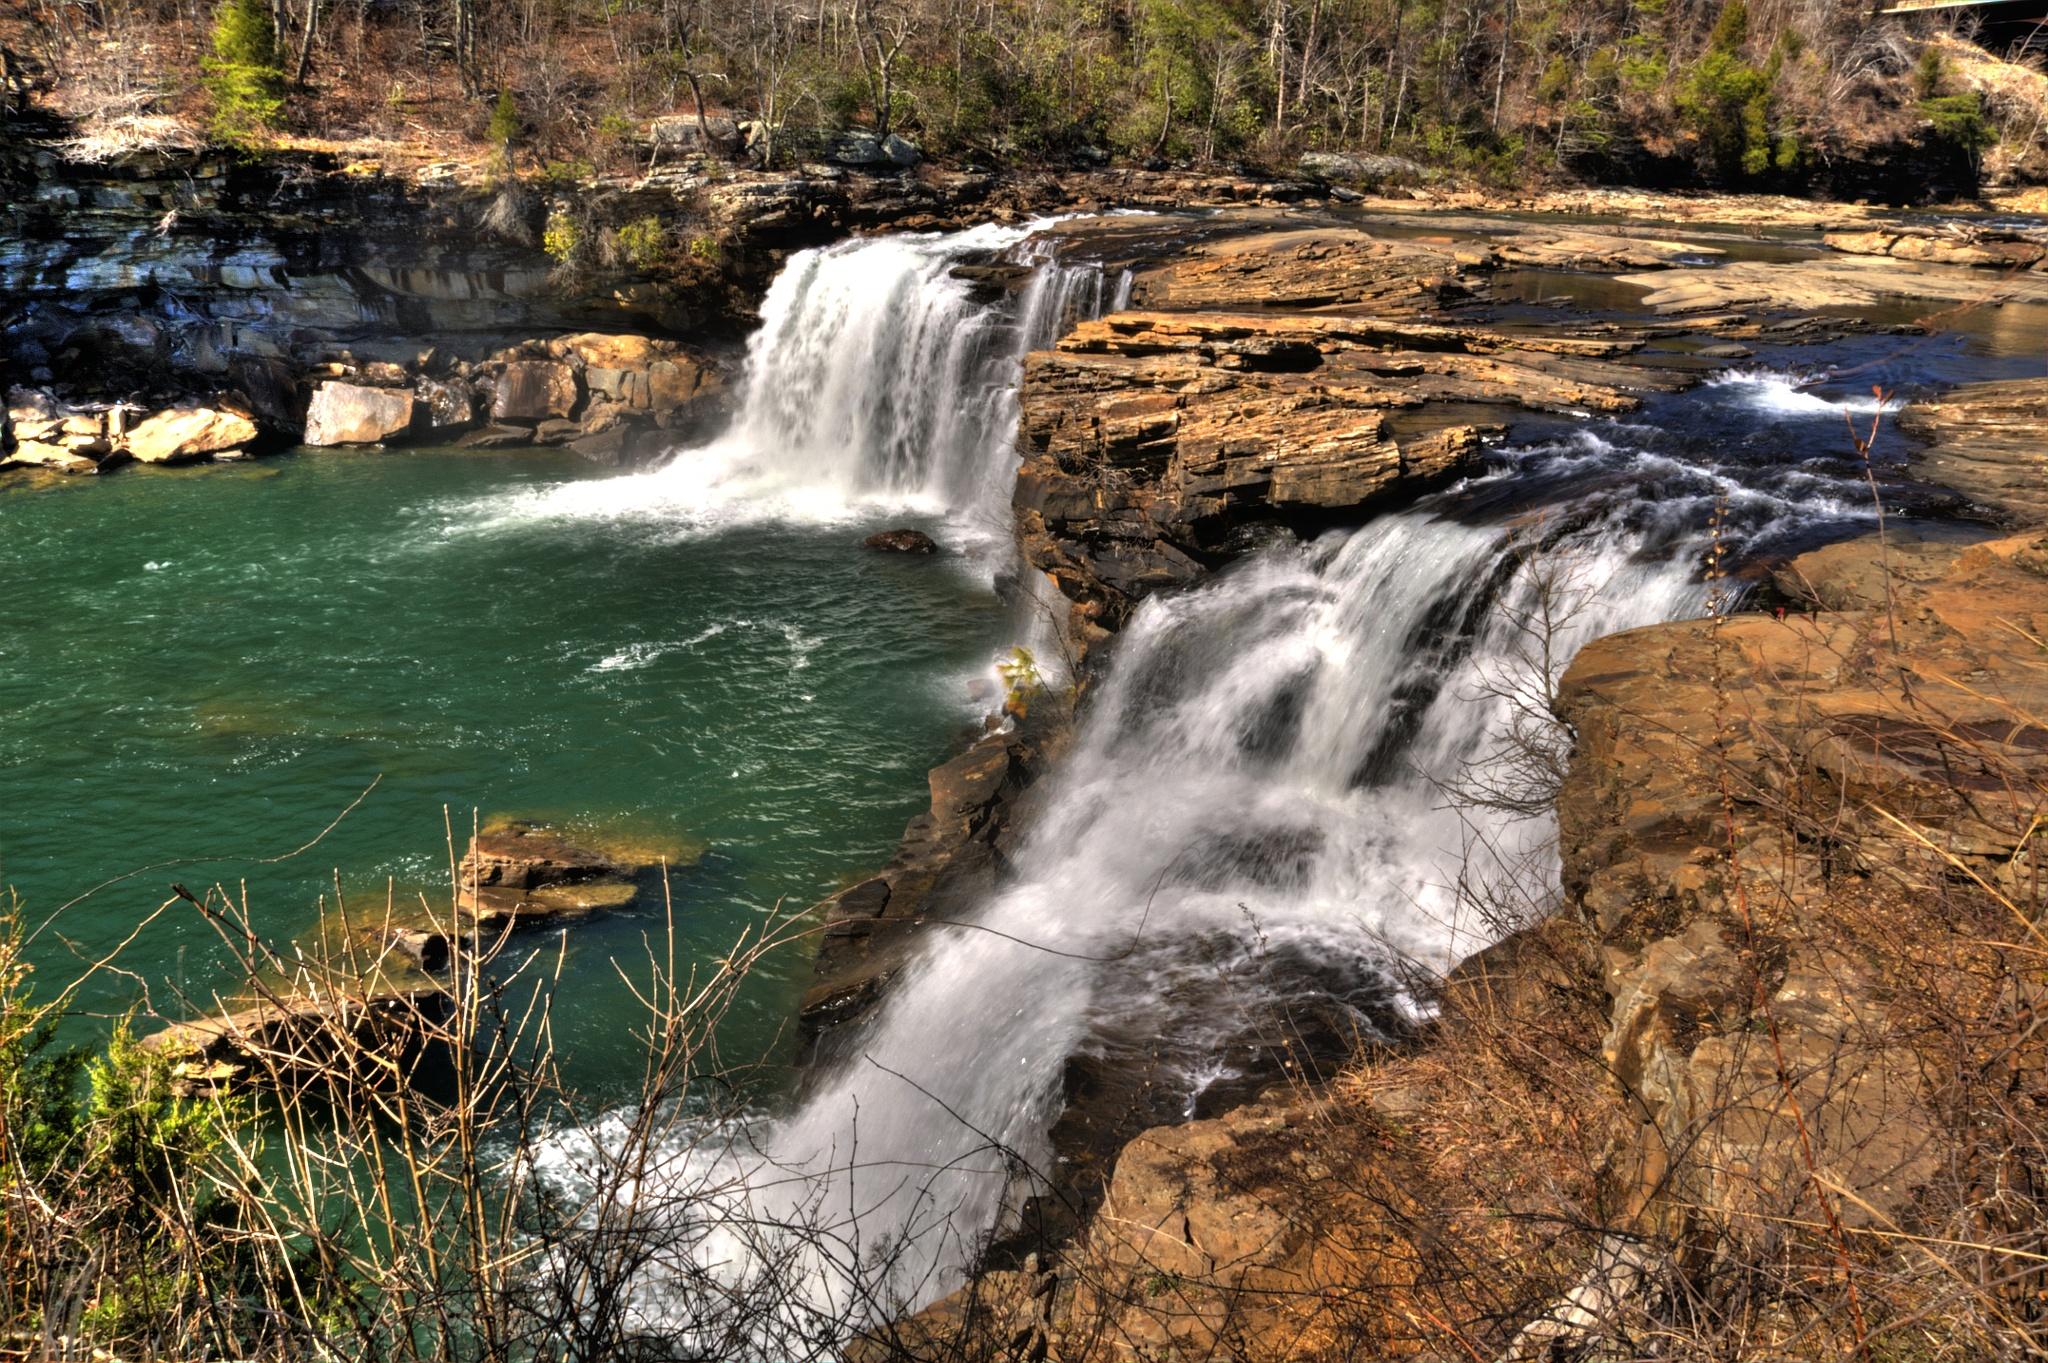 """Little River Falls"" by PeterMichael"